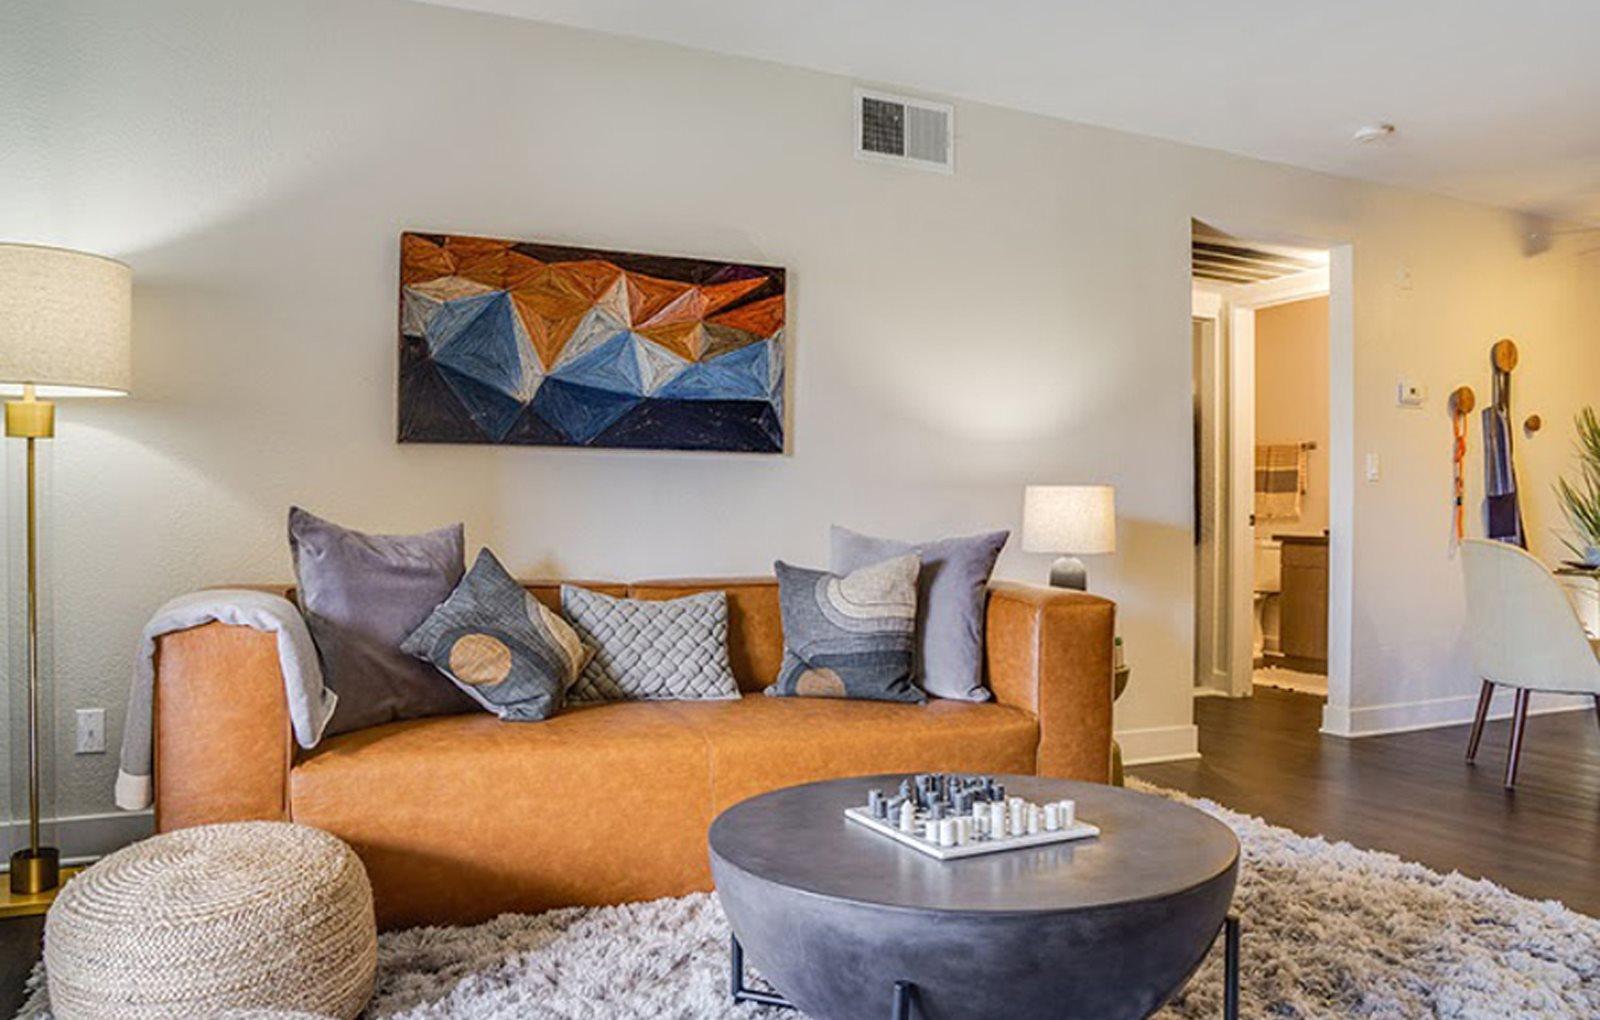 Luxurious Interiors at Solterra at Civic Center, Norwalk, 90650